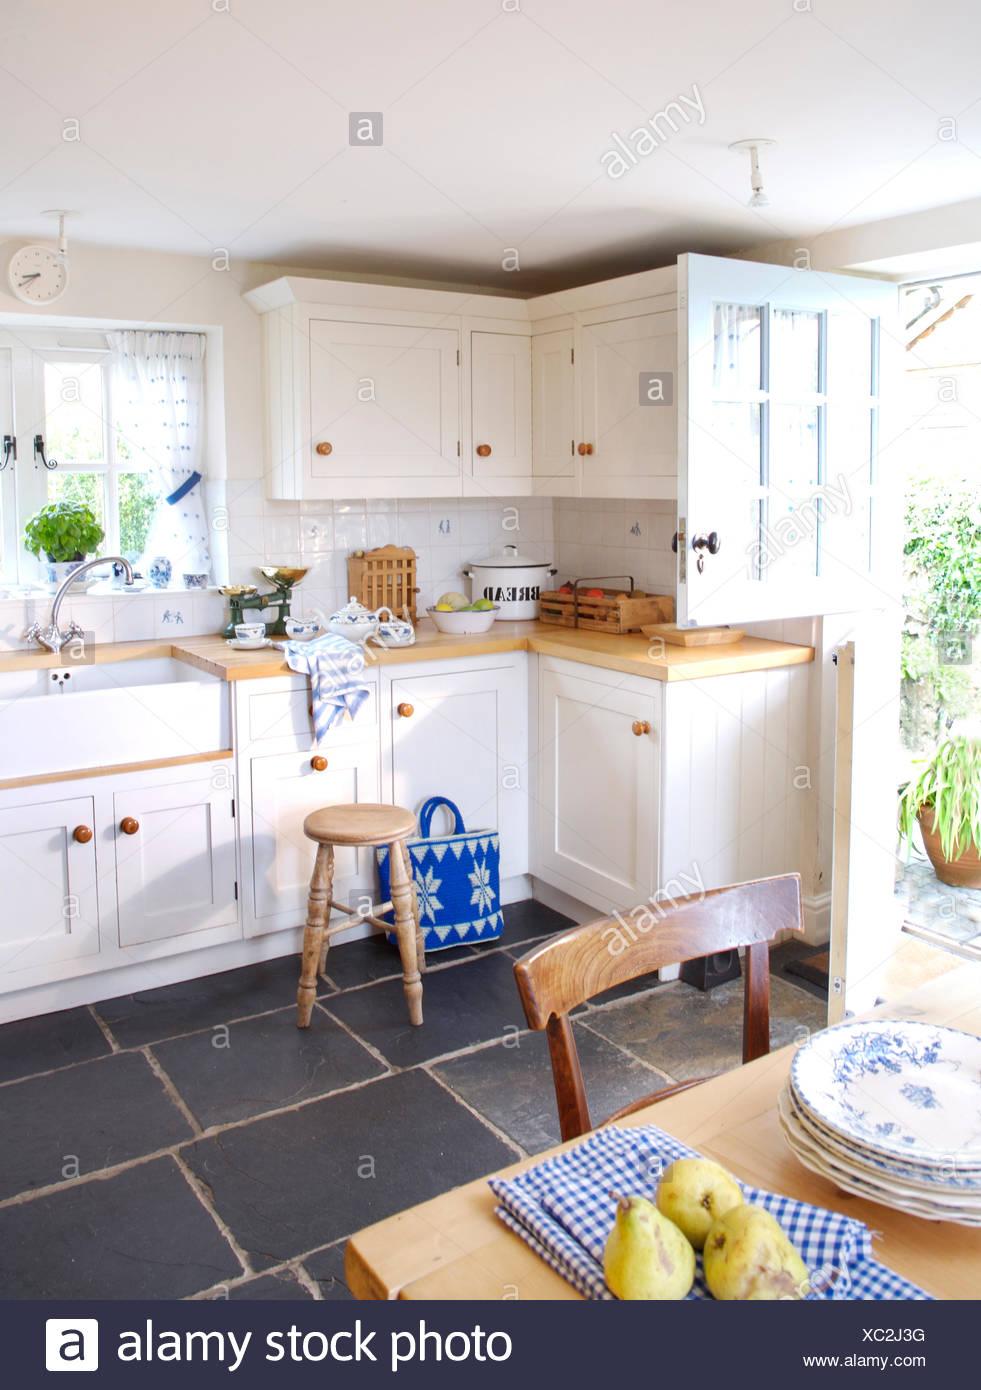 Luxury Wadhams Country Kitchen Illustration - Best Kitchen Ideas - i ...